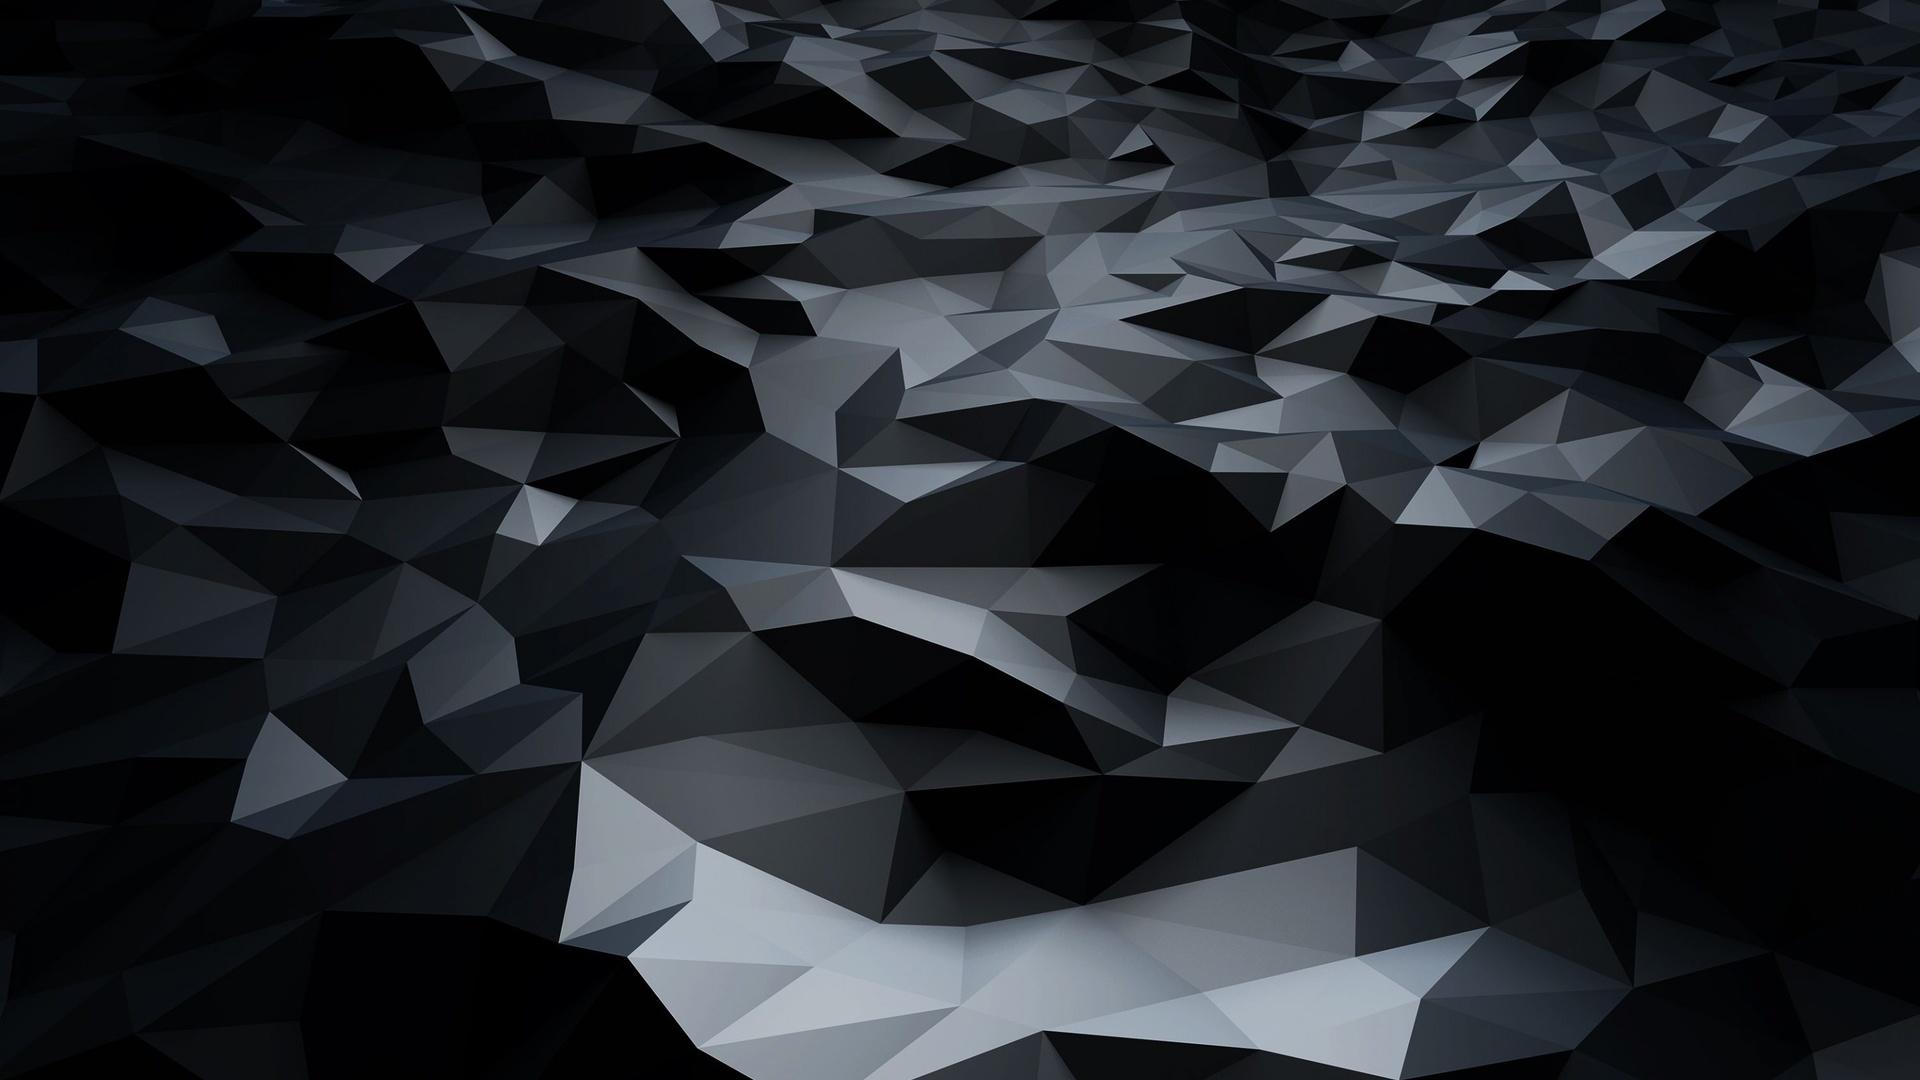 Black Abstract nice wallpaper